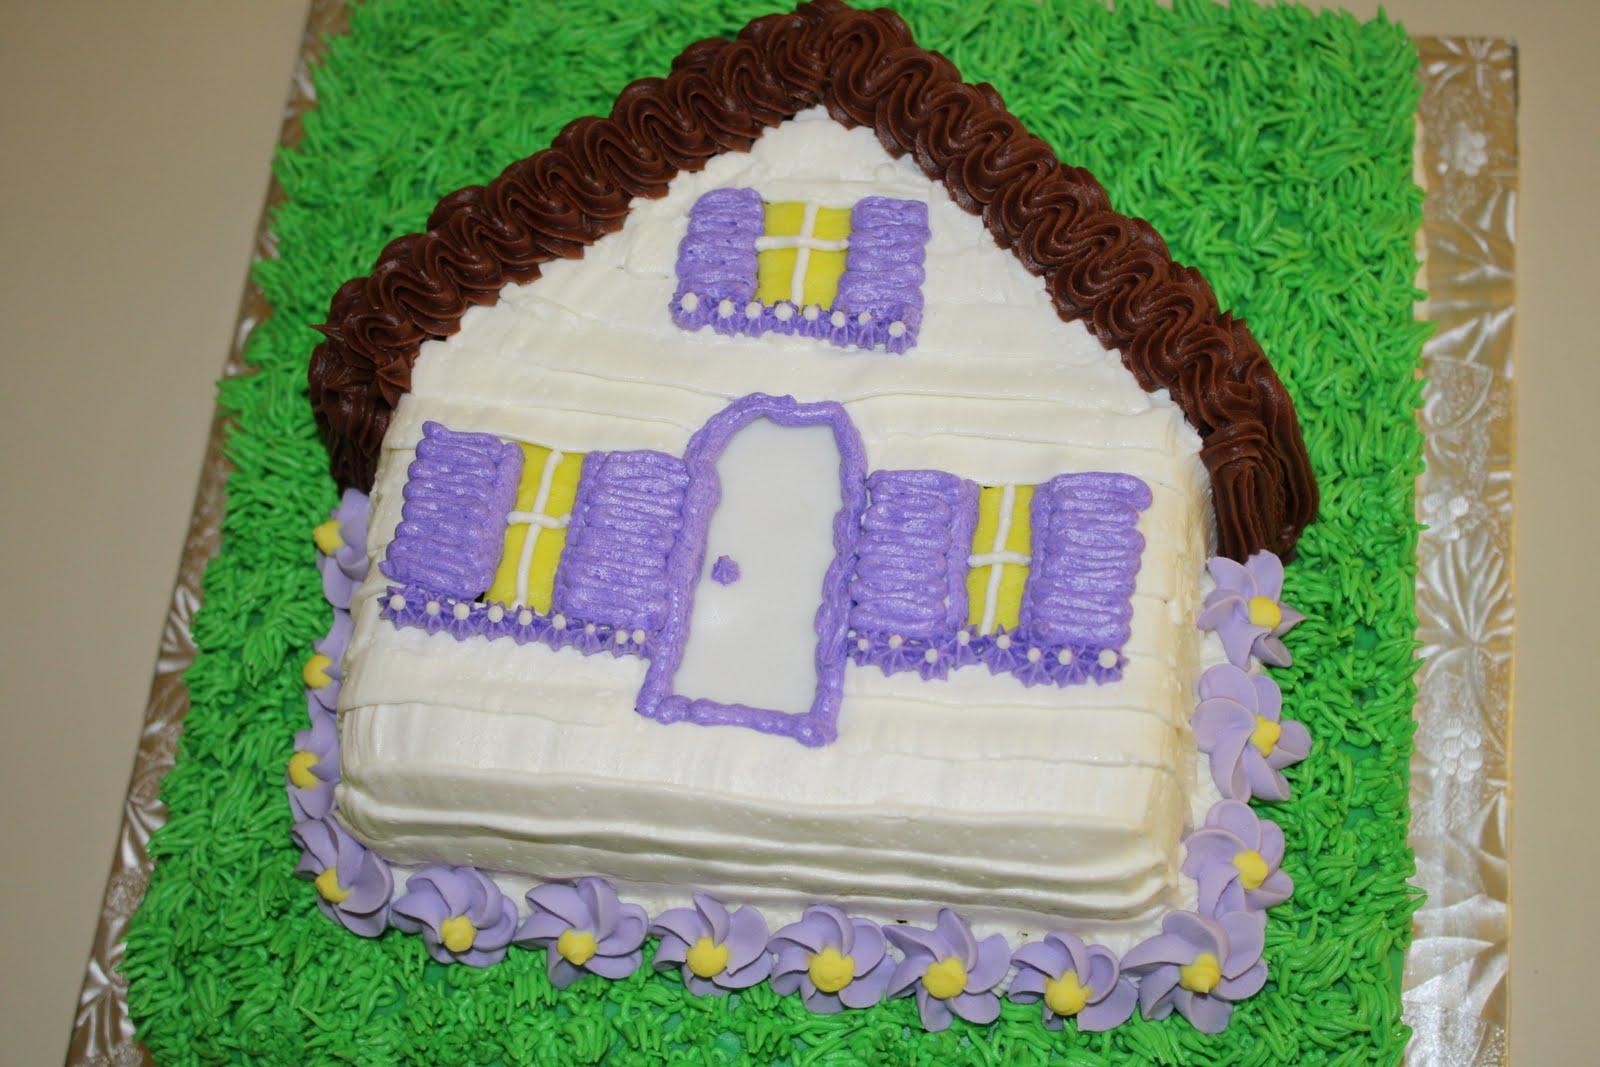 Cake Decorating Ideas For Housewarming : CC s Cake Decorating: Housewarming cake